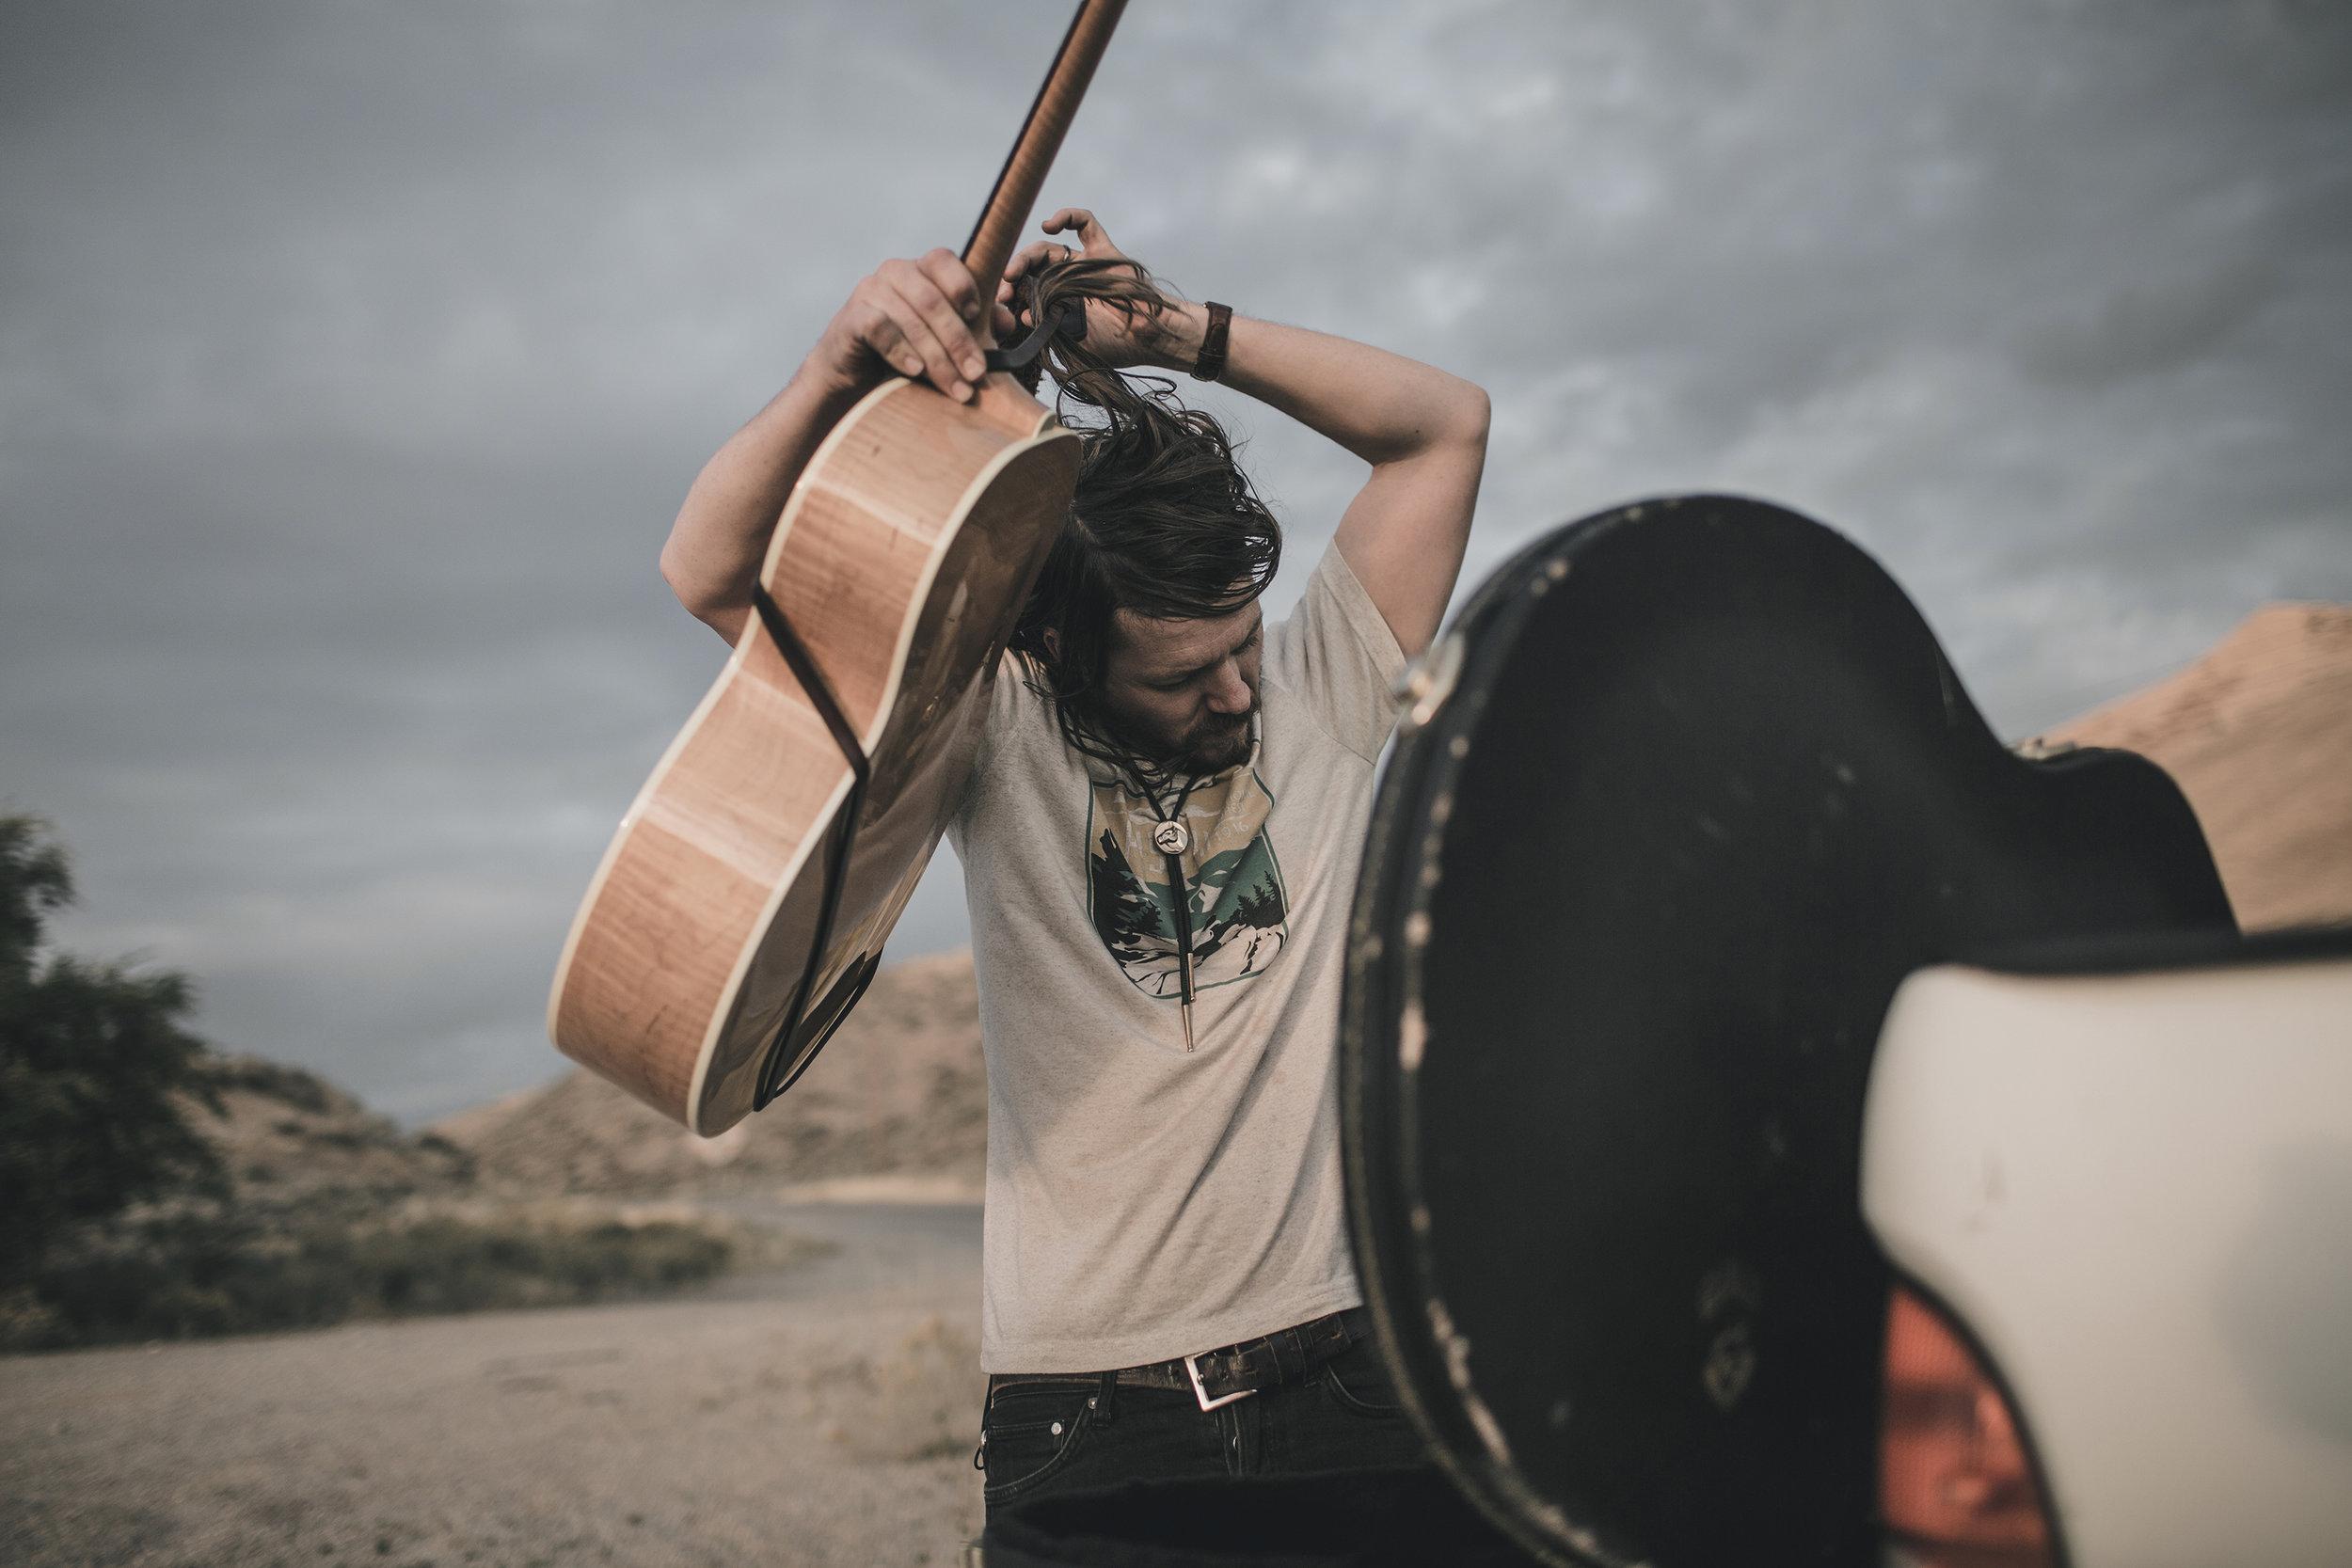 © duston–todd–country-cowboy–guitar-grey-sky-17.jpg